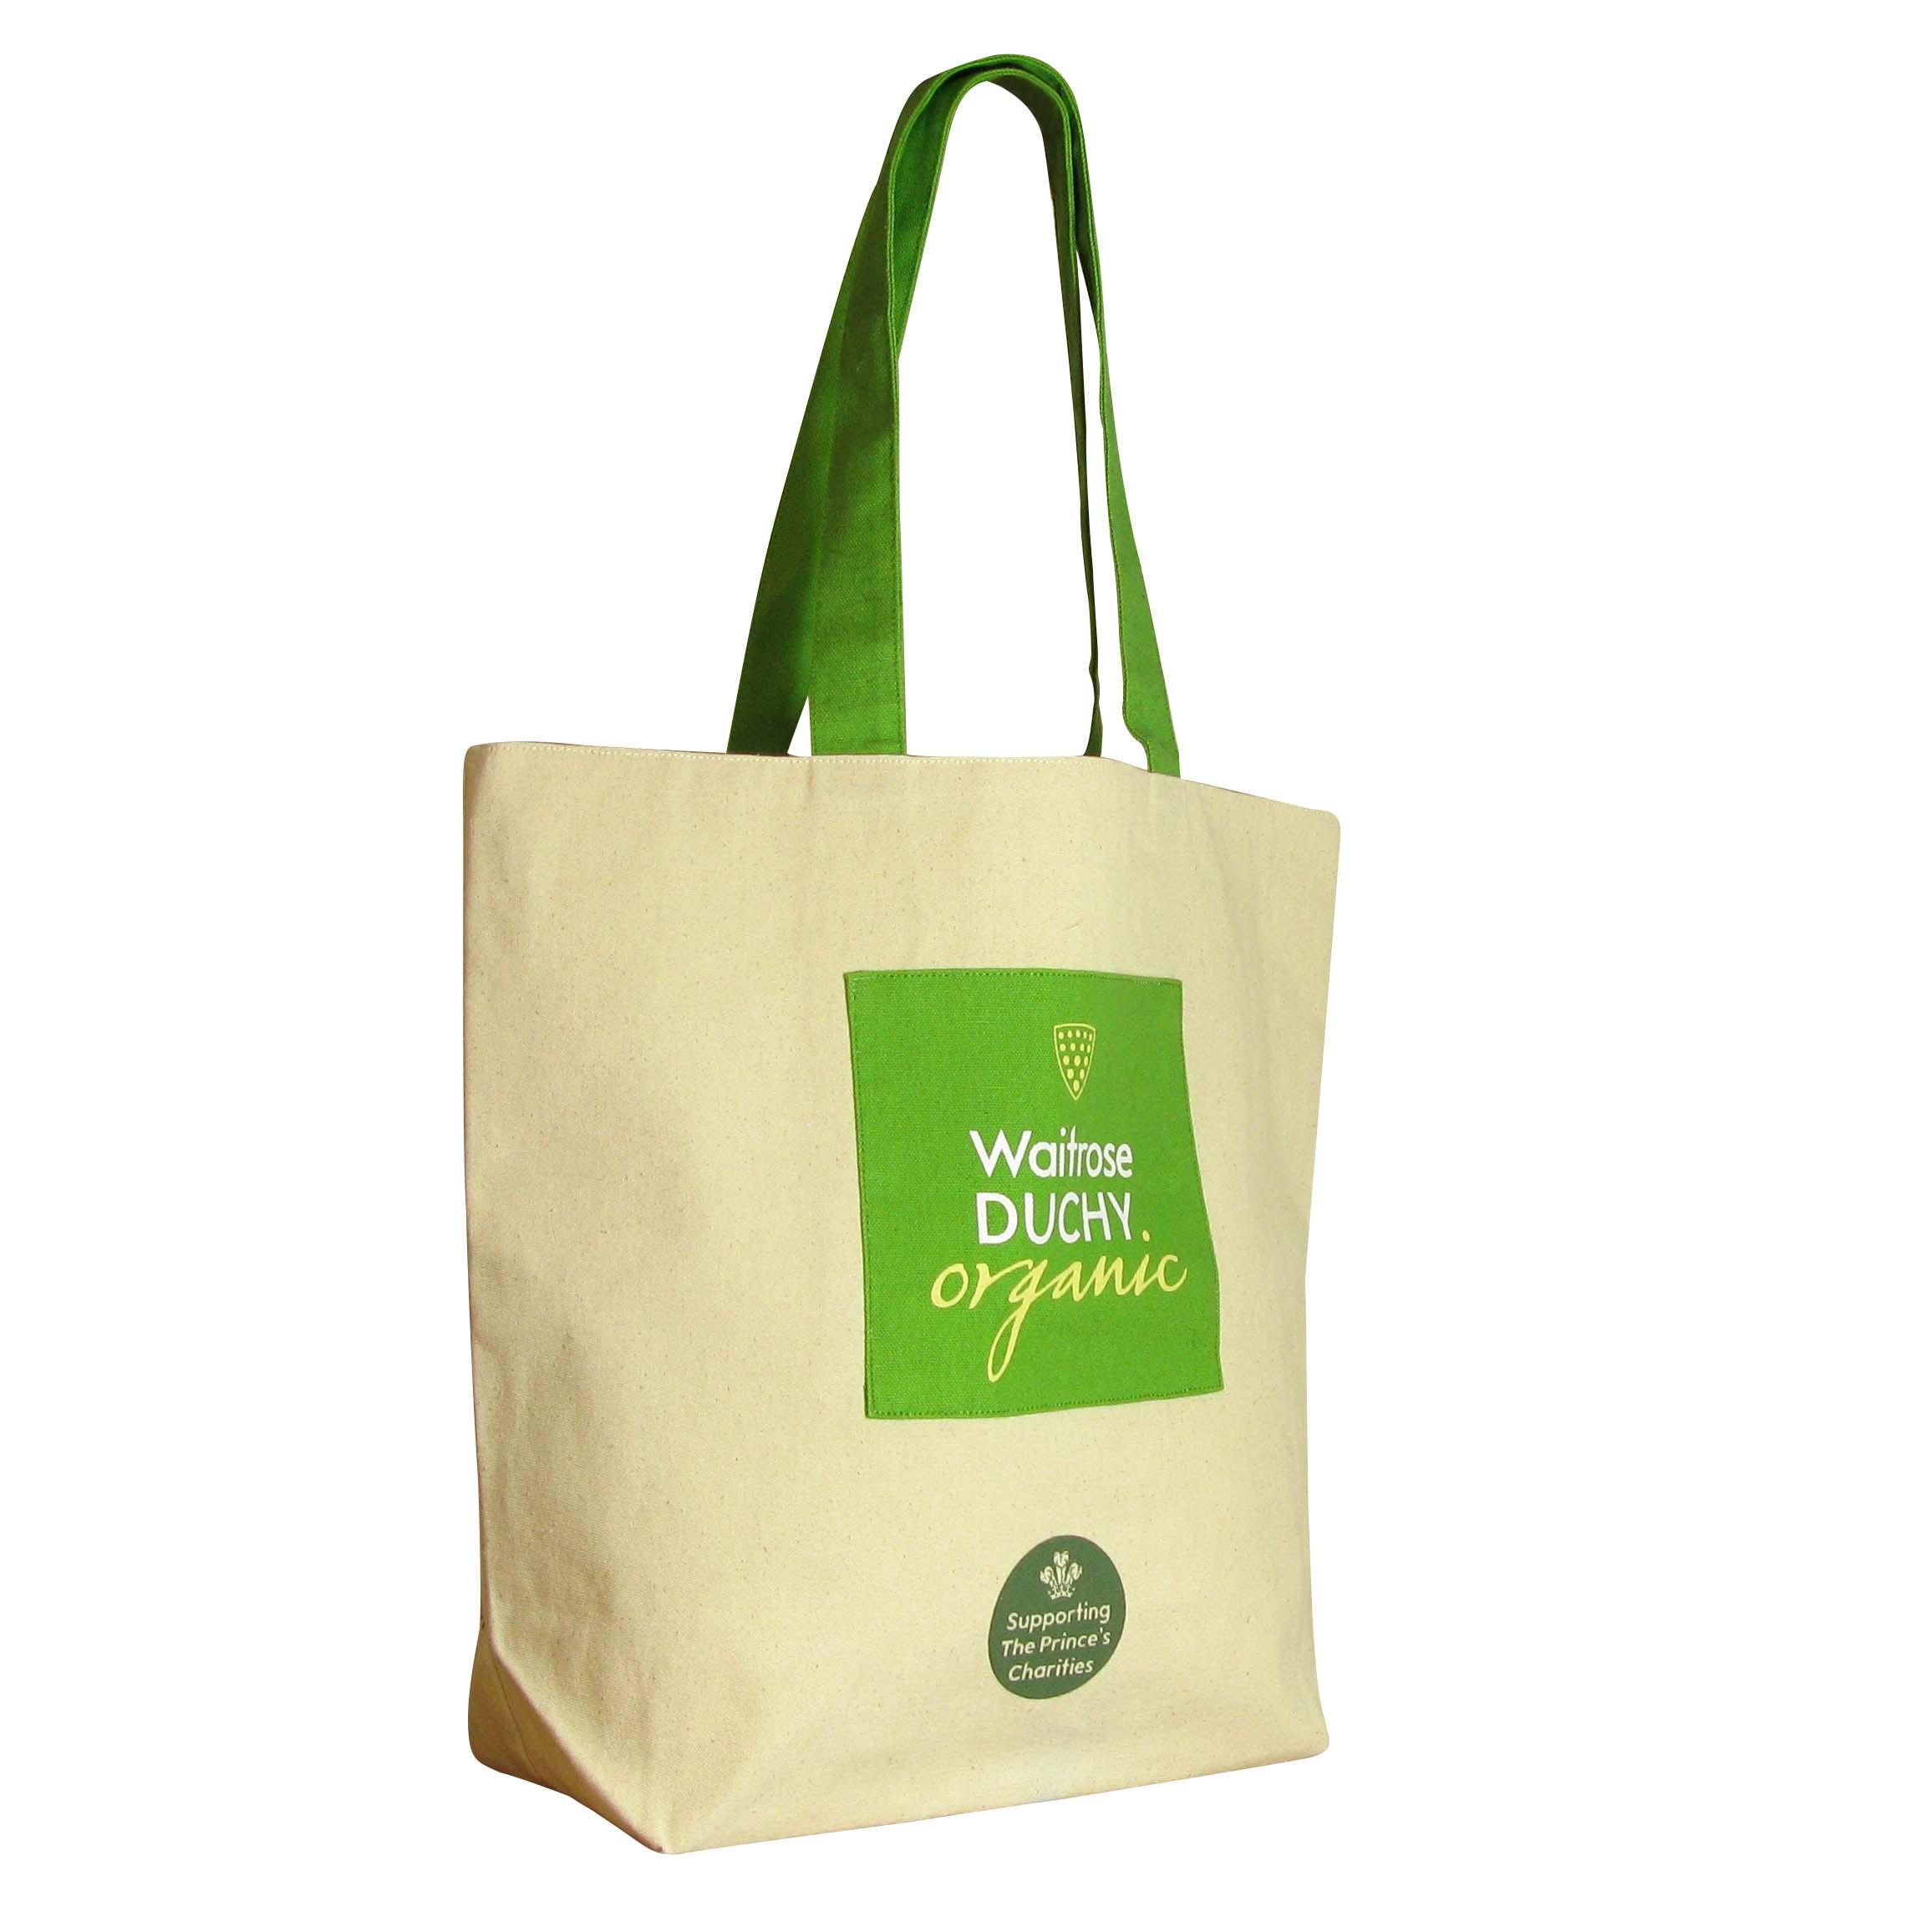 Waitrose Duchy Bag